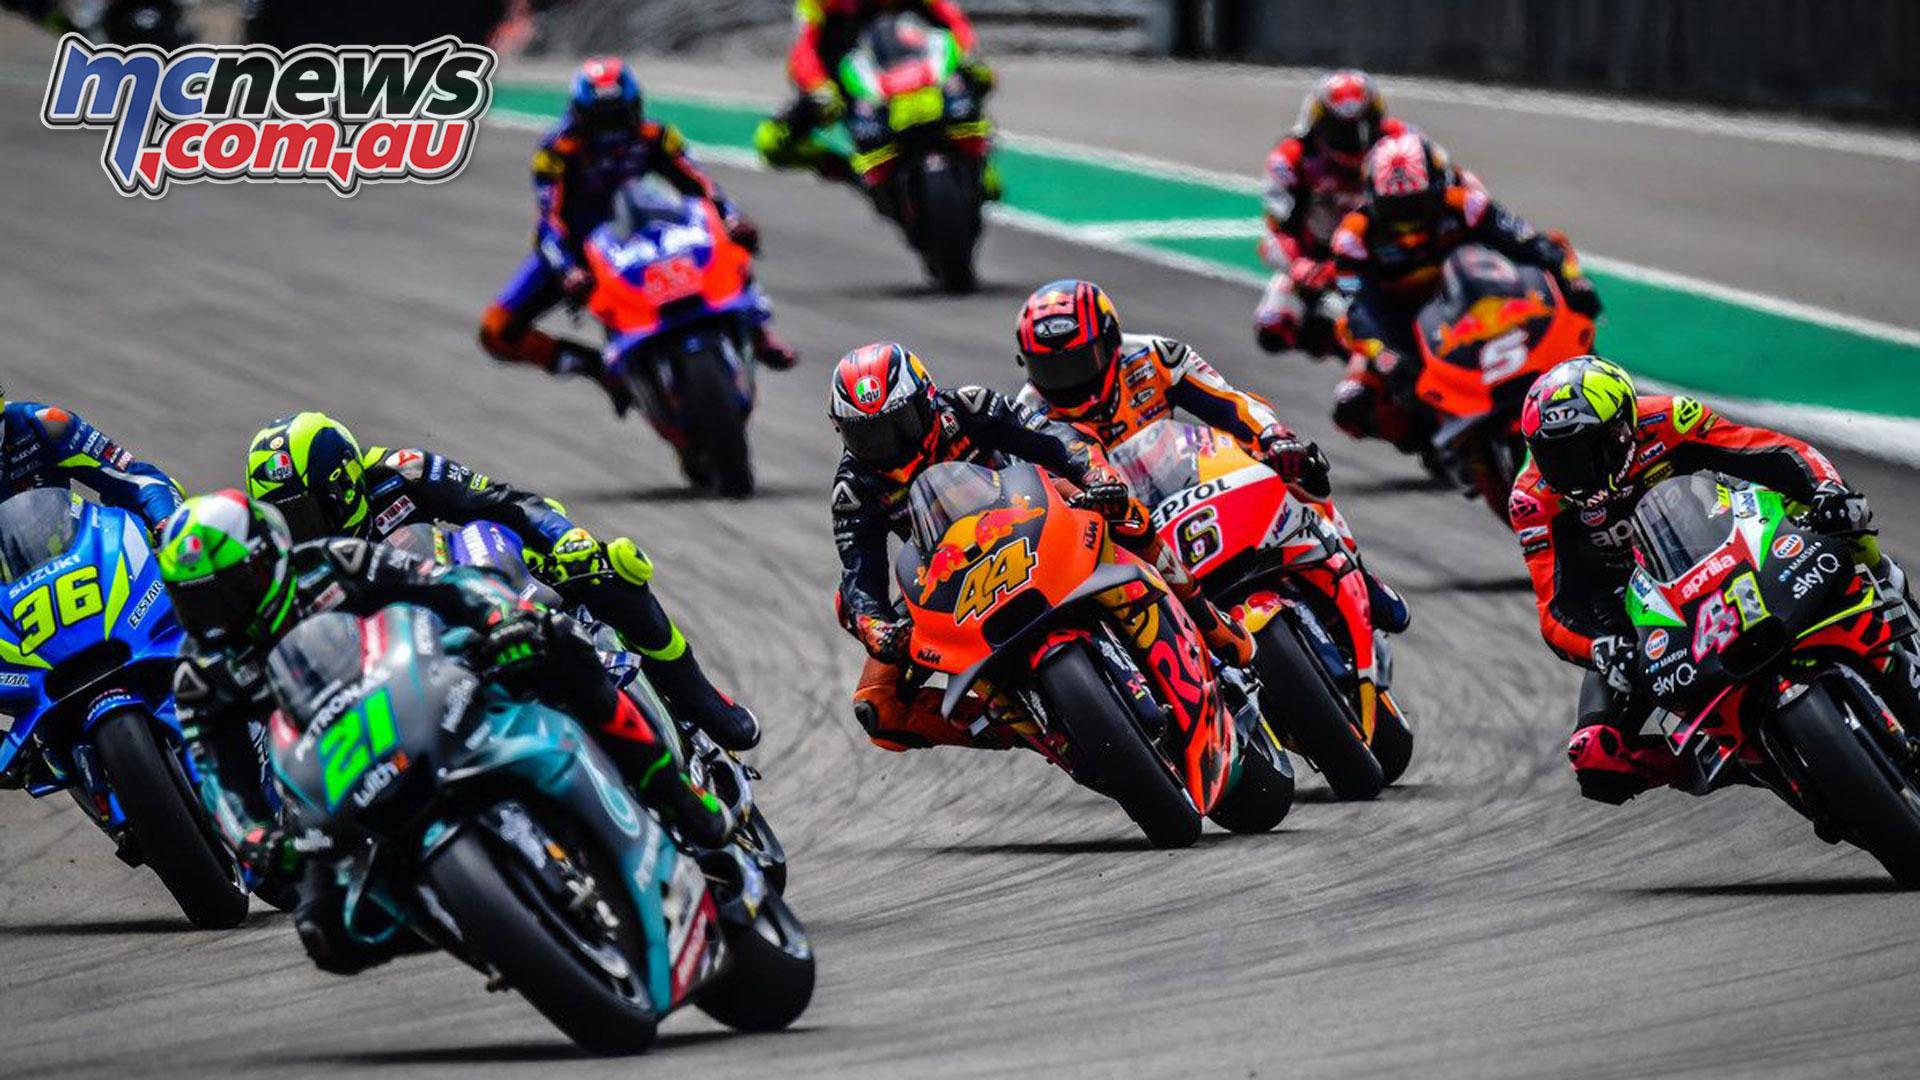 MotoGP Rnd Sachsenring Germany Pol Espargaro